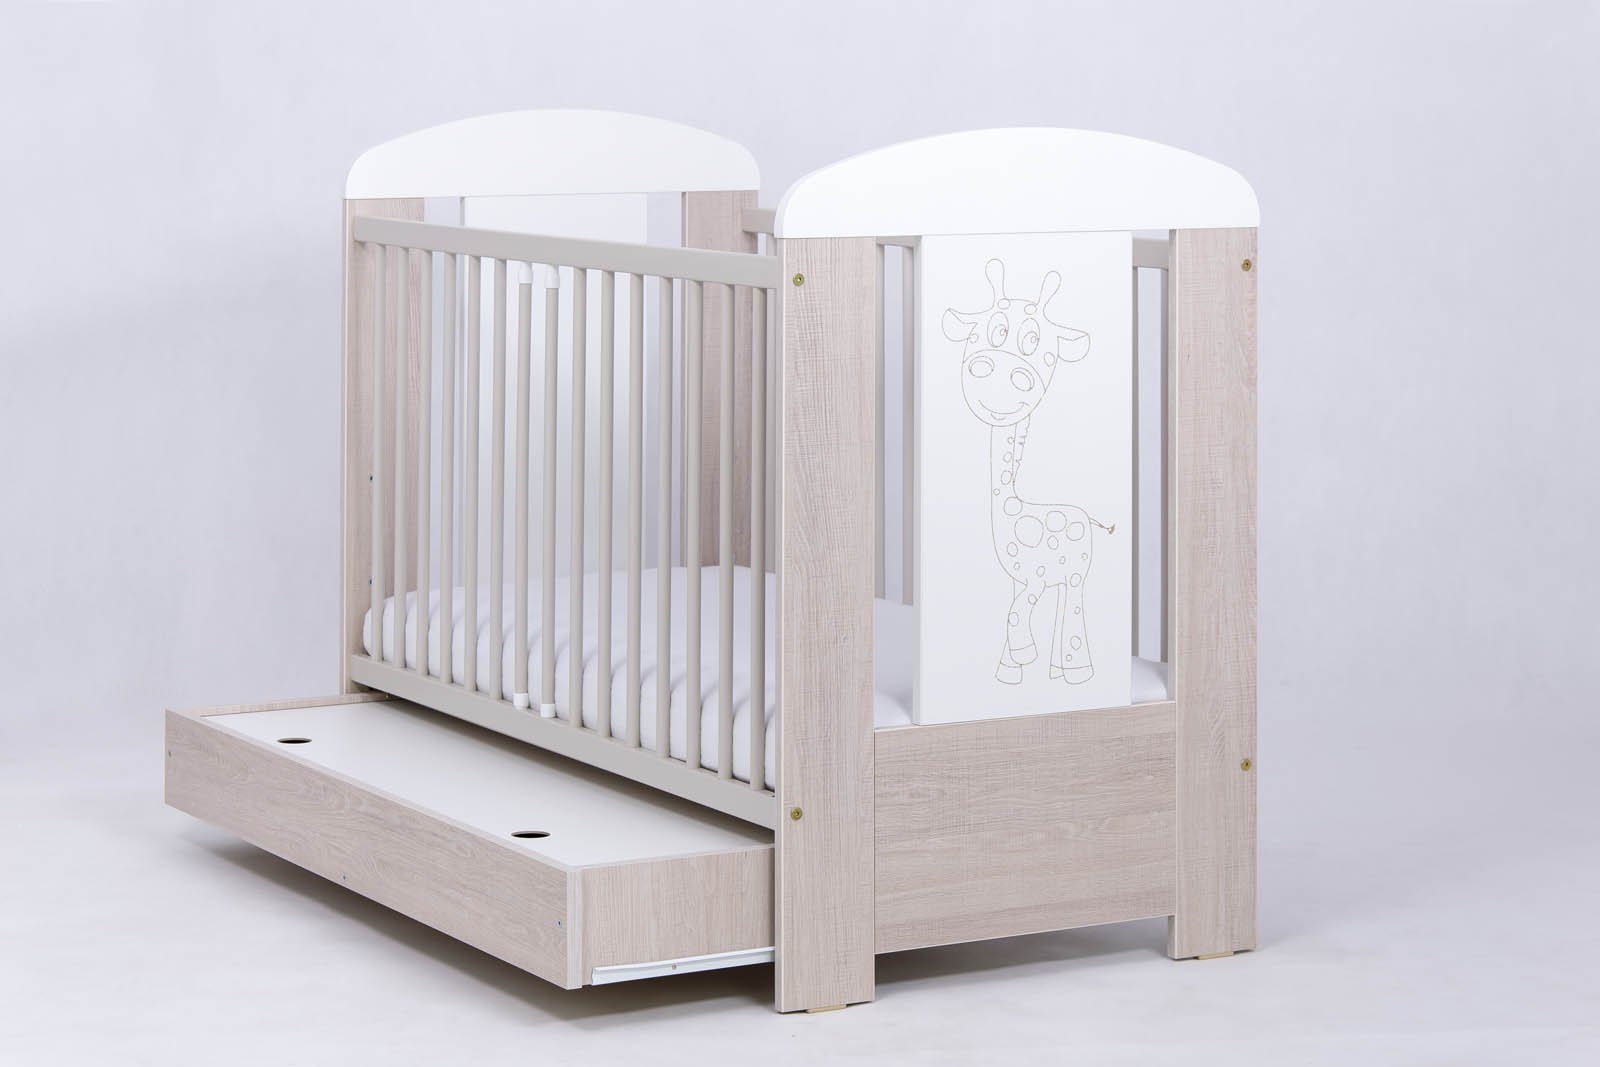 Bērnu gulta ar kasti Drewex GIRAFFE (Žyrafka) oak santana